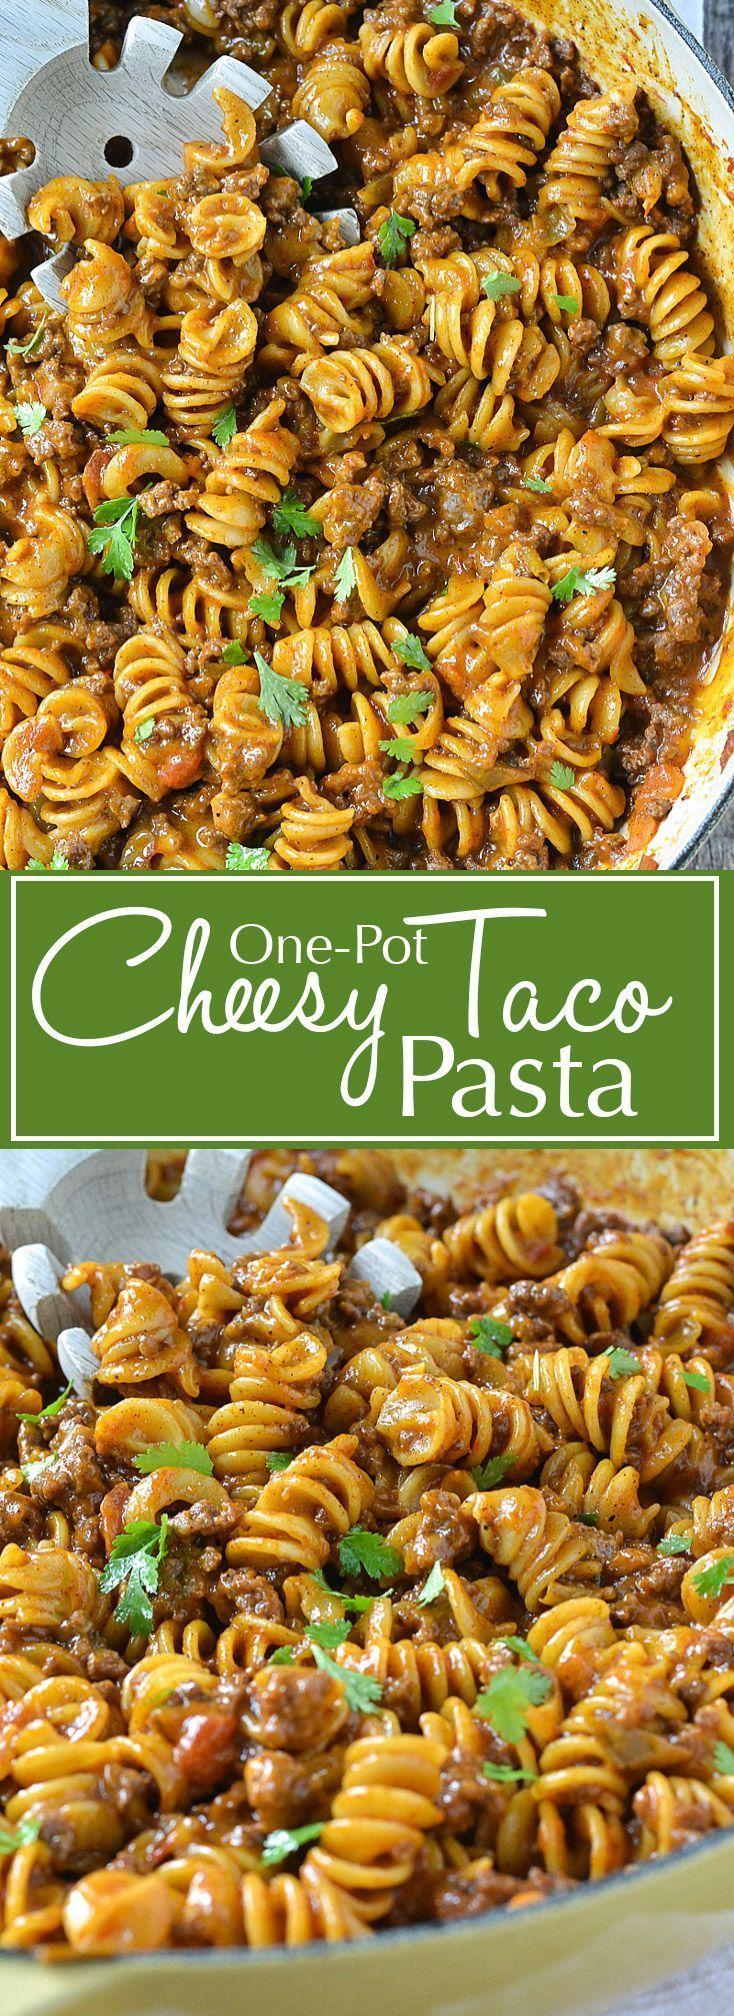 One-Pot Cheesy Taco Pasta   http://www.motherthyme.com